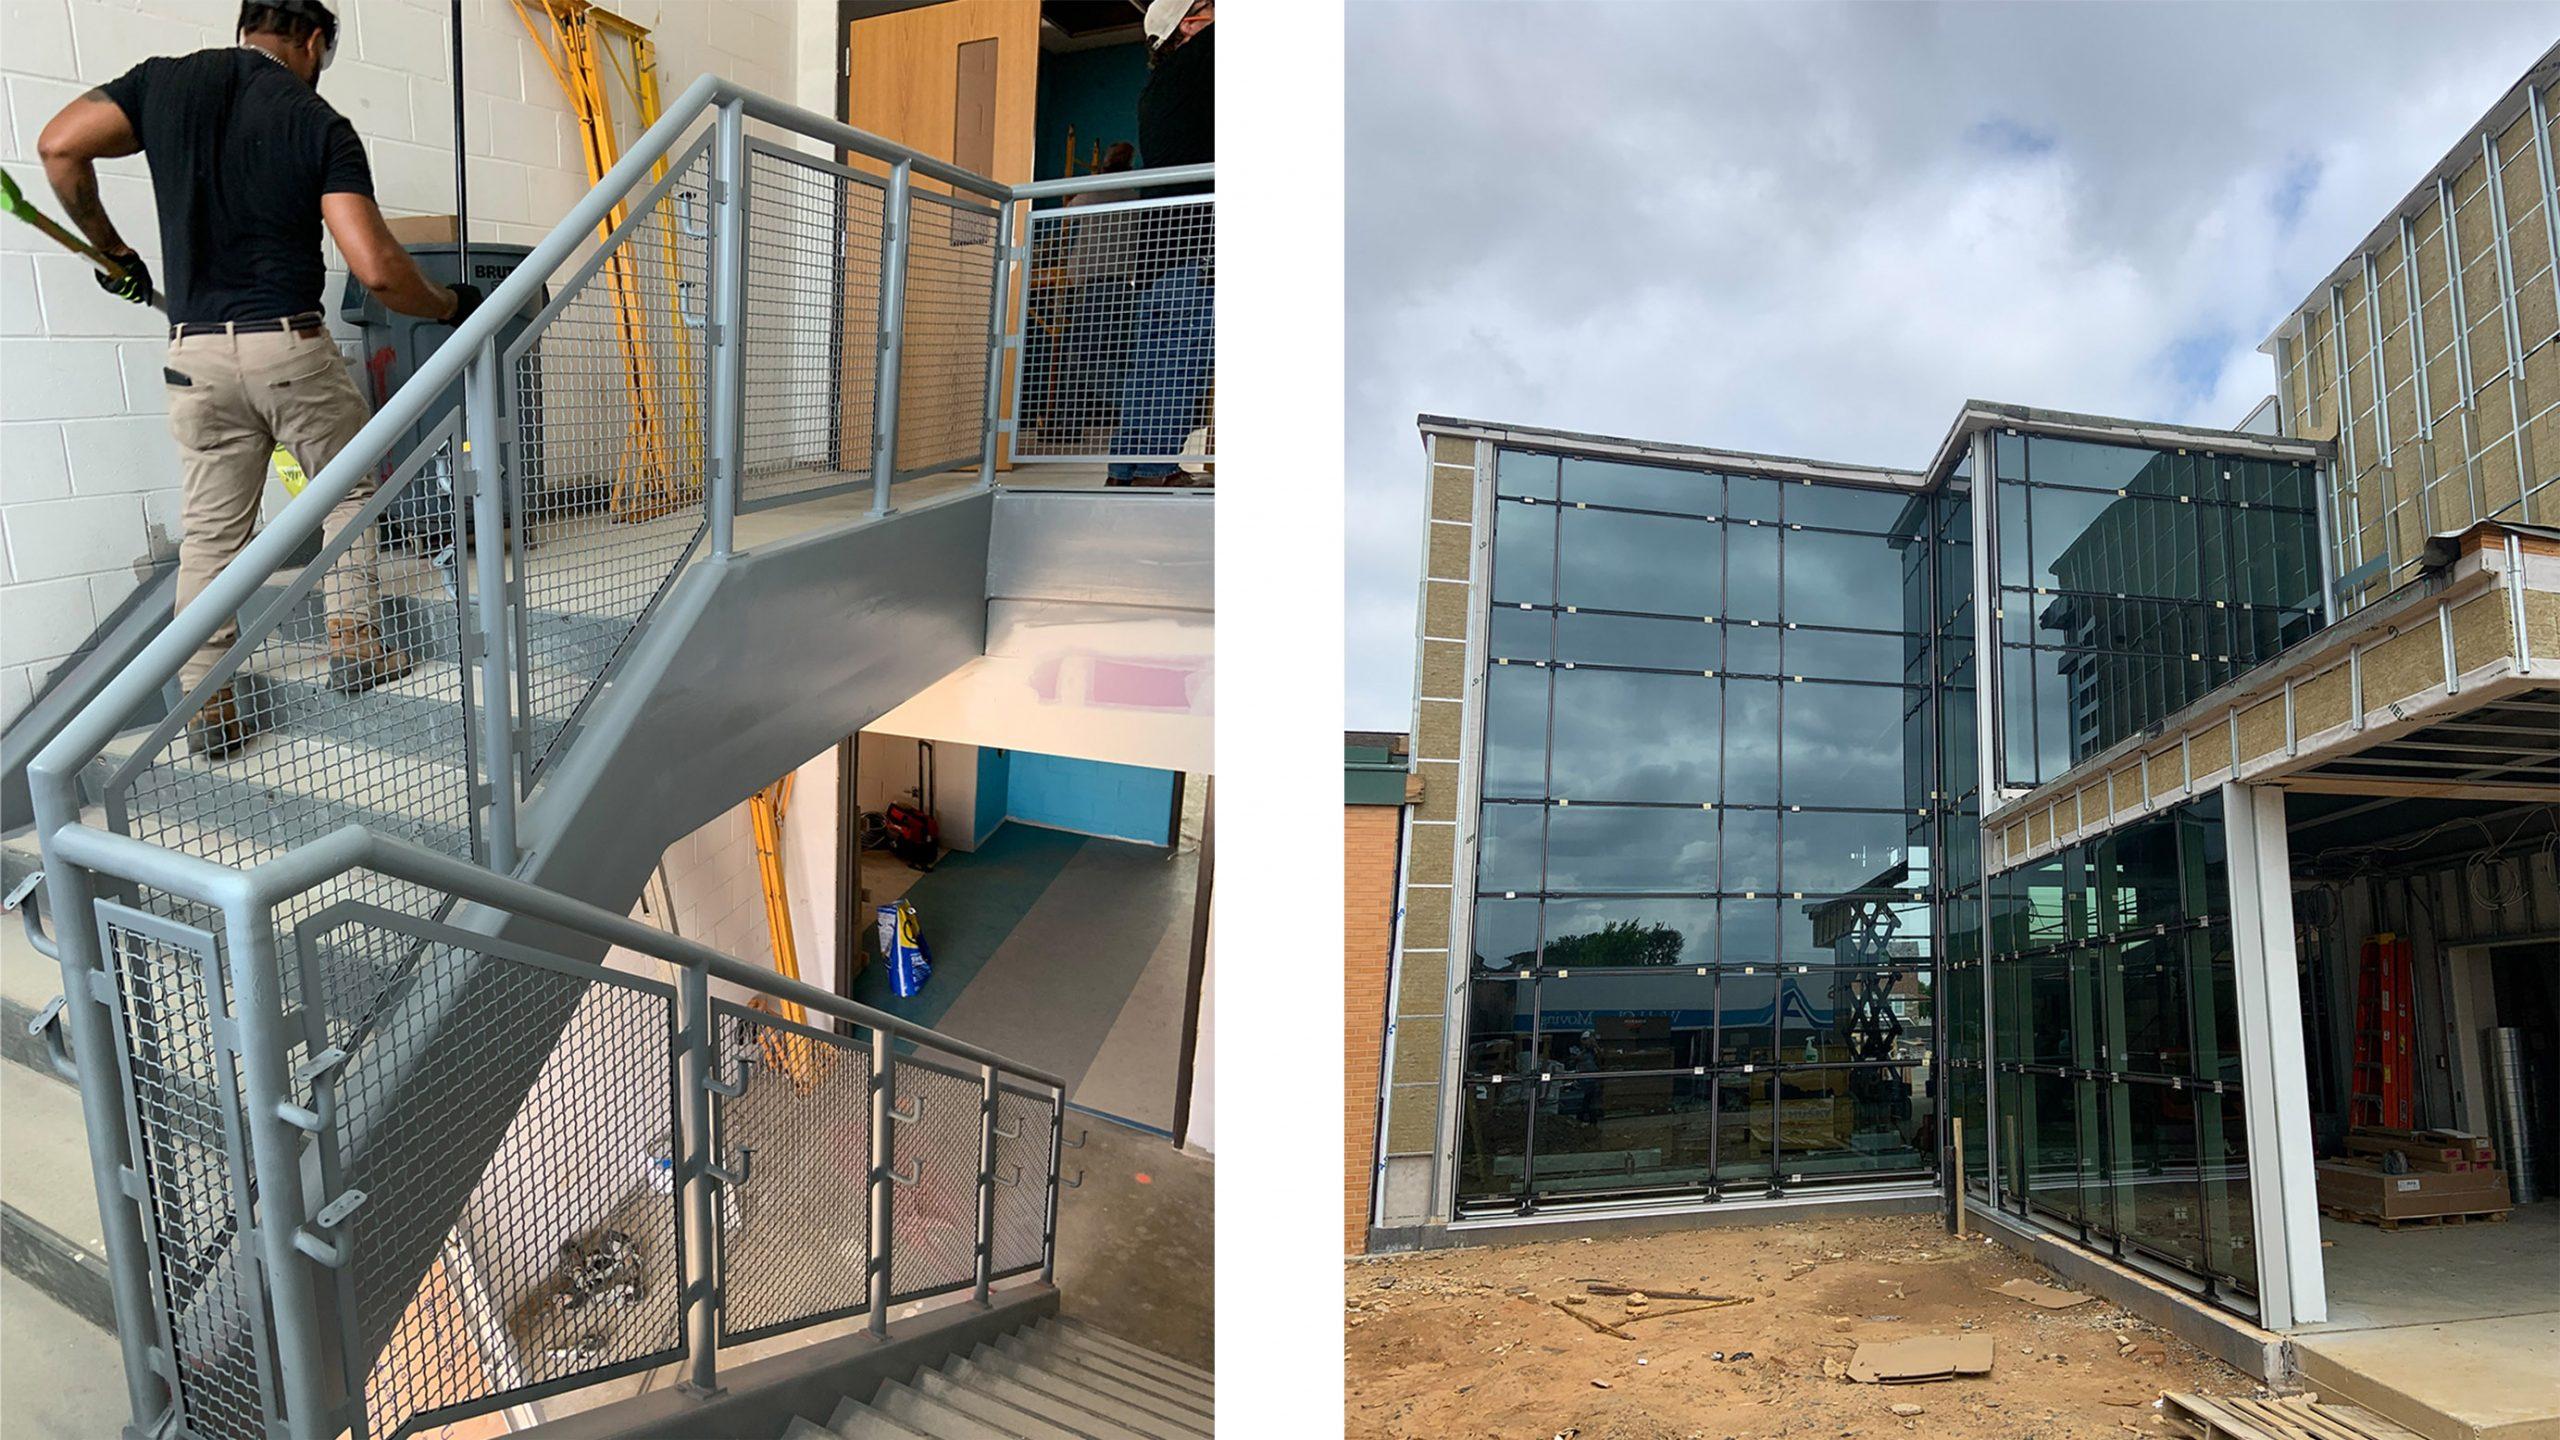 3-Anne-Frank-Elementary-School_SCHRADERGROUP_May-Construction-Progress